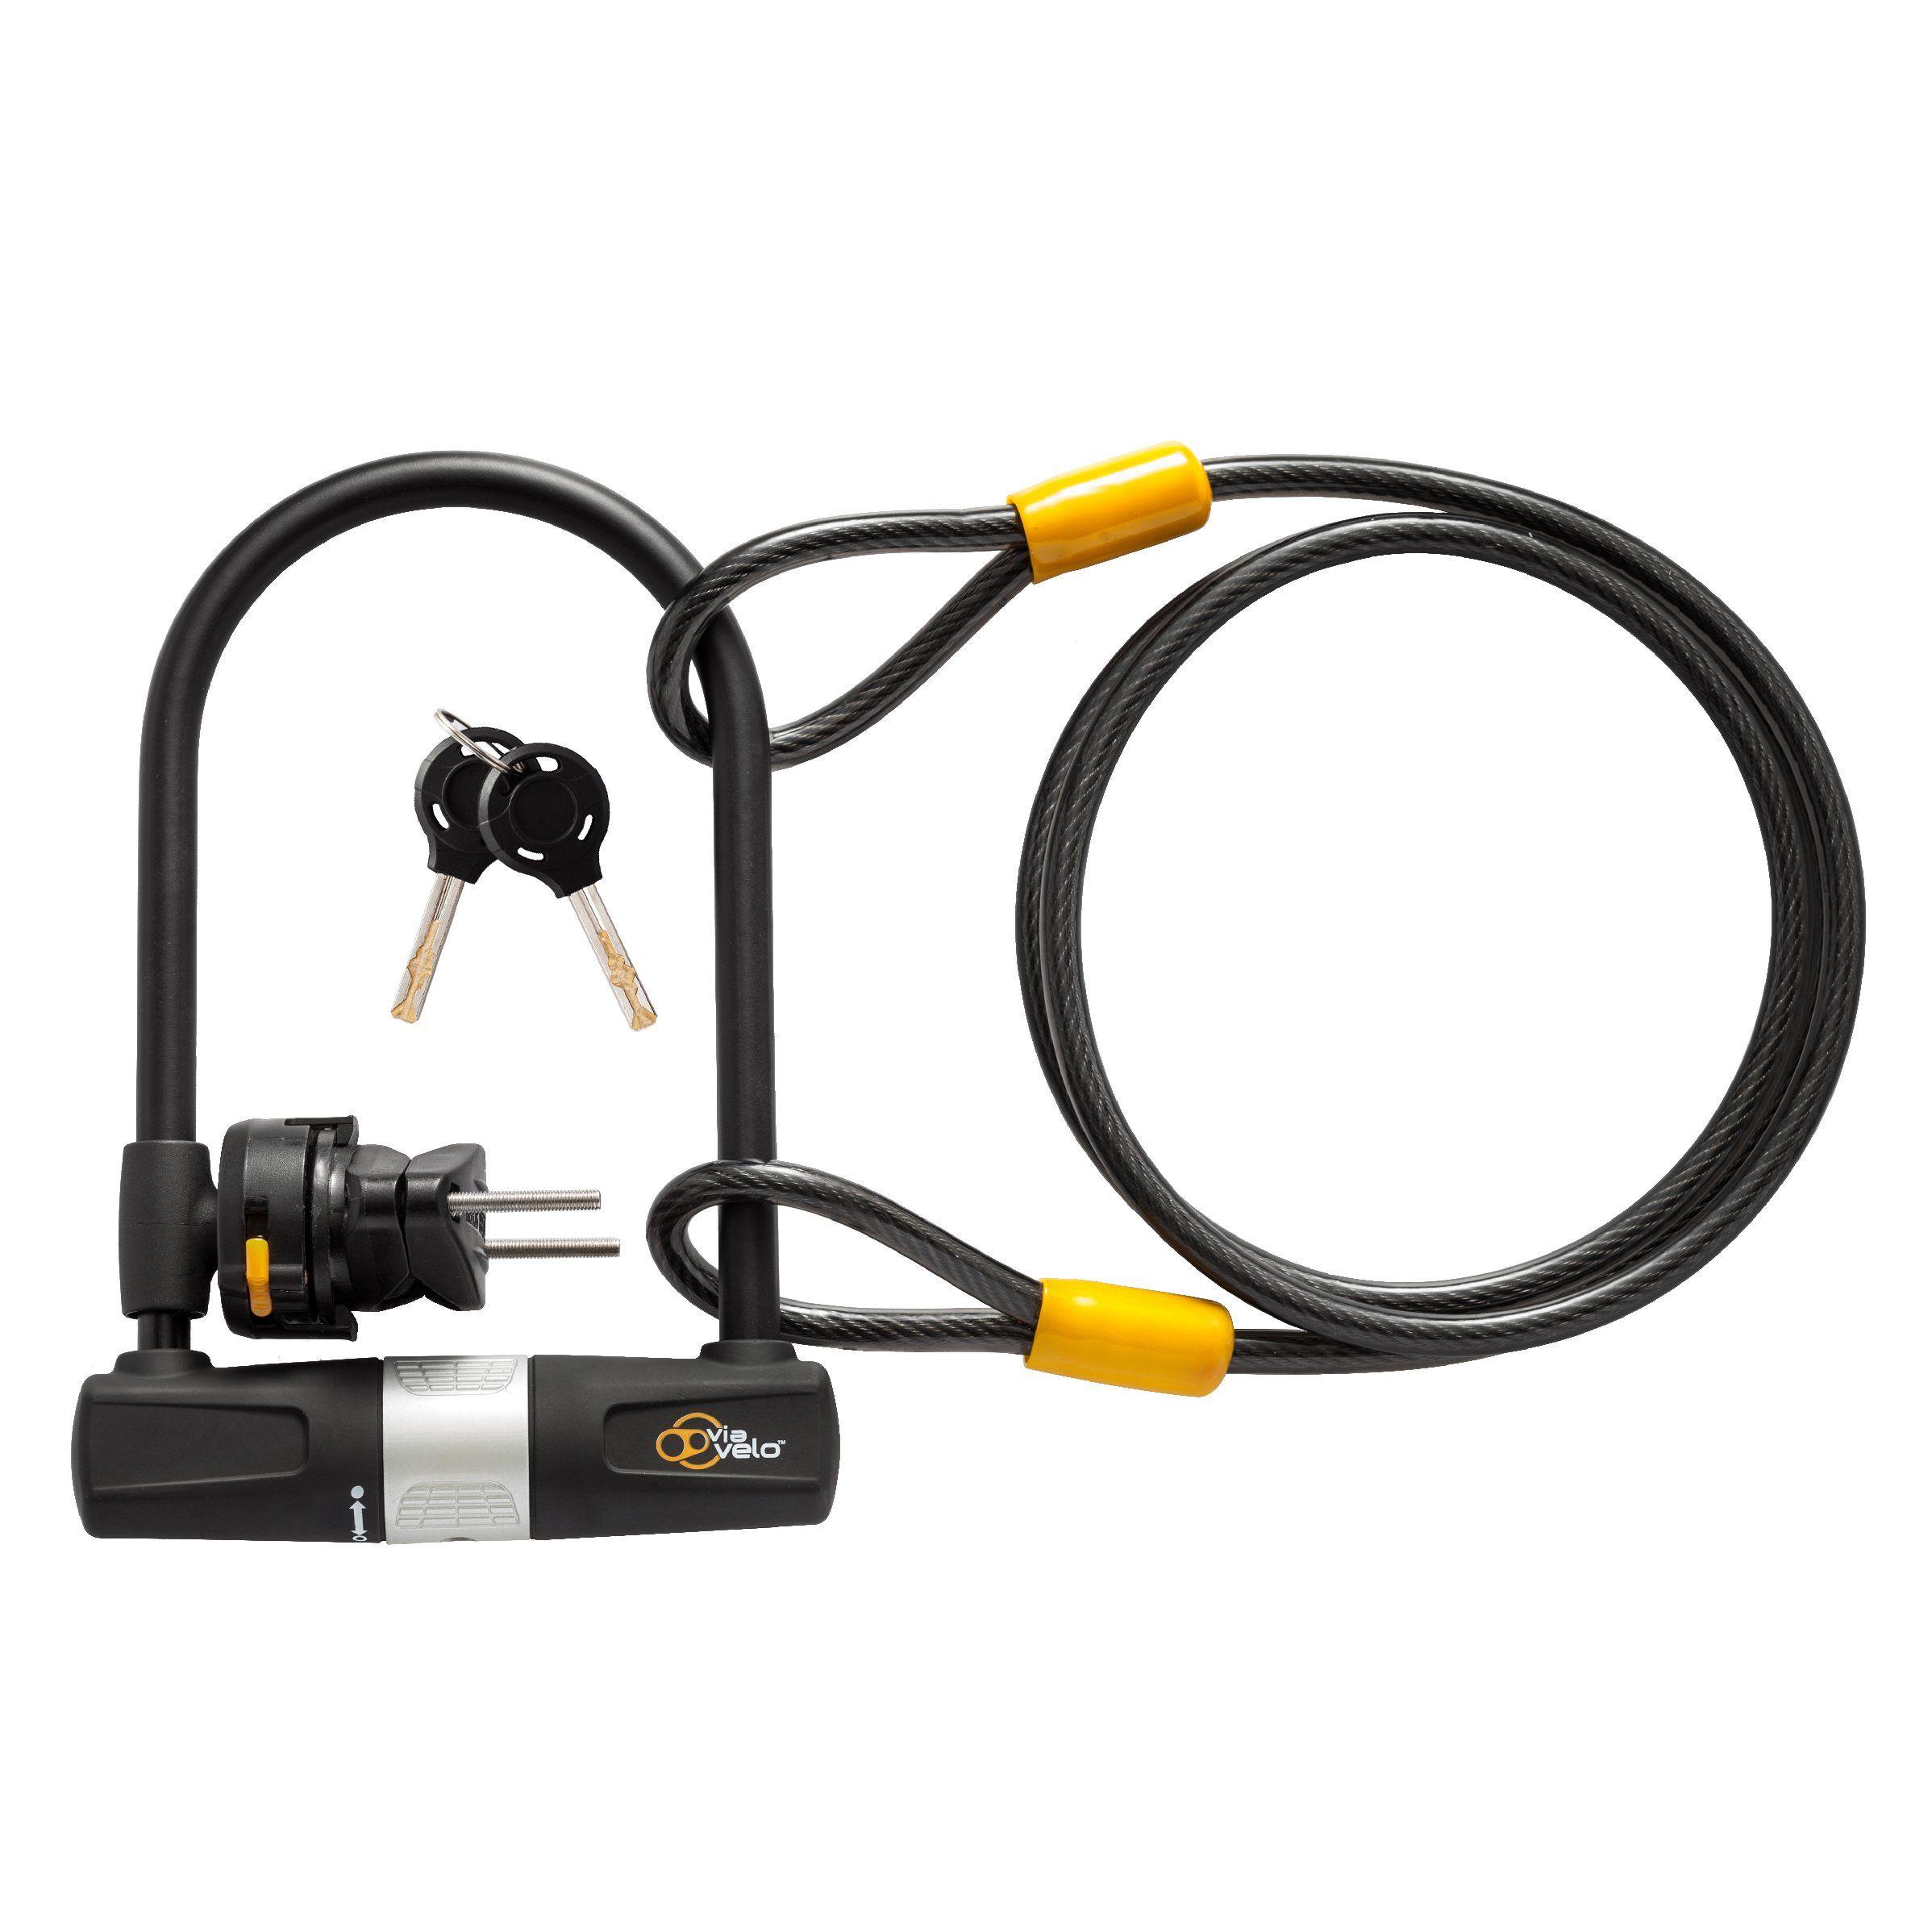 Bike U Lock With Cable Via Velo Heavy Duty Bicycle Ulock14mm